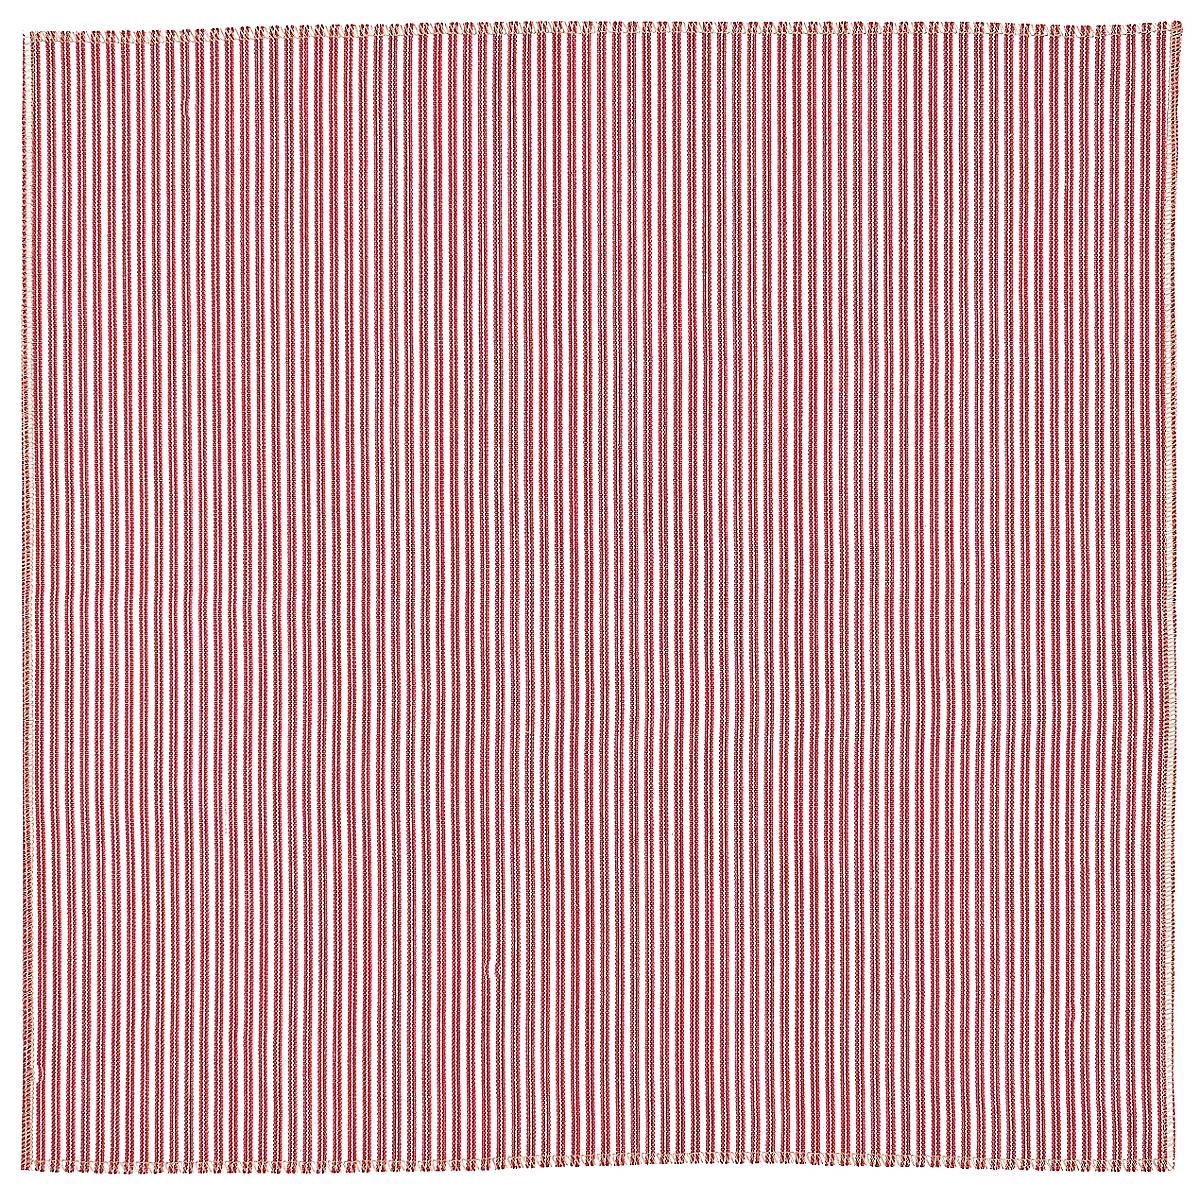 Tic Toc: Rhubarb (fabric yardage)